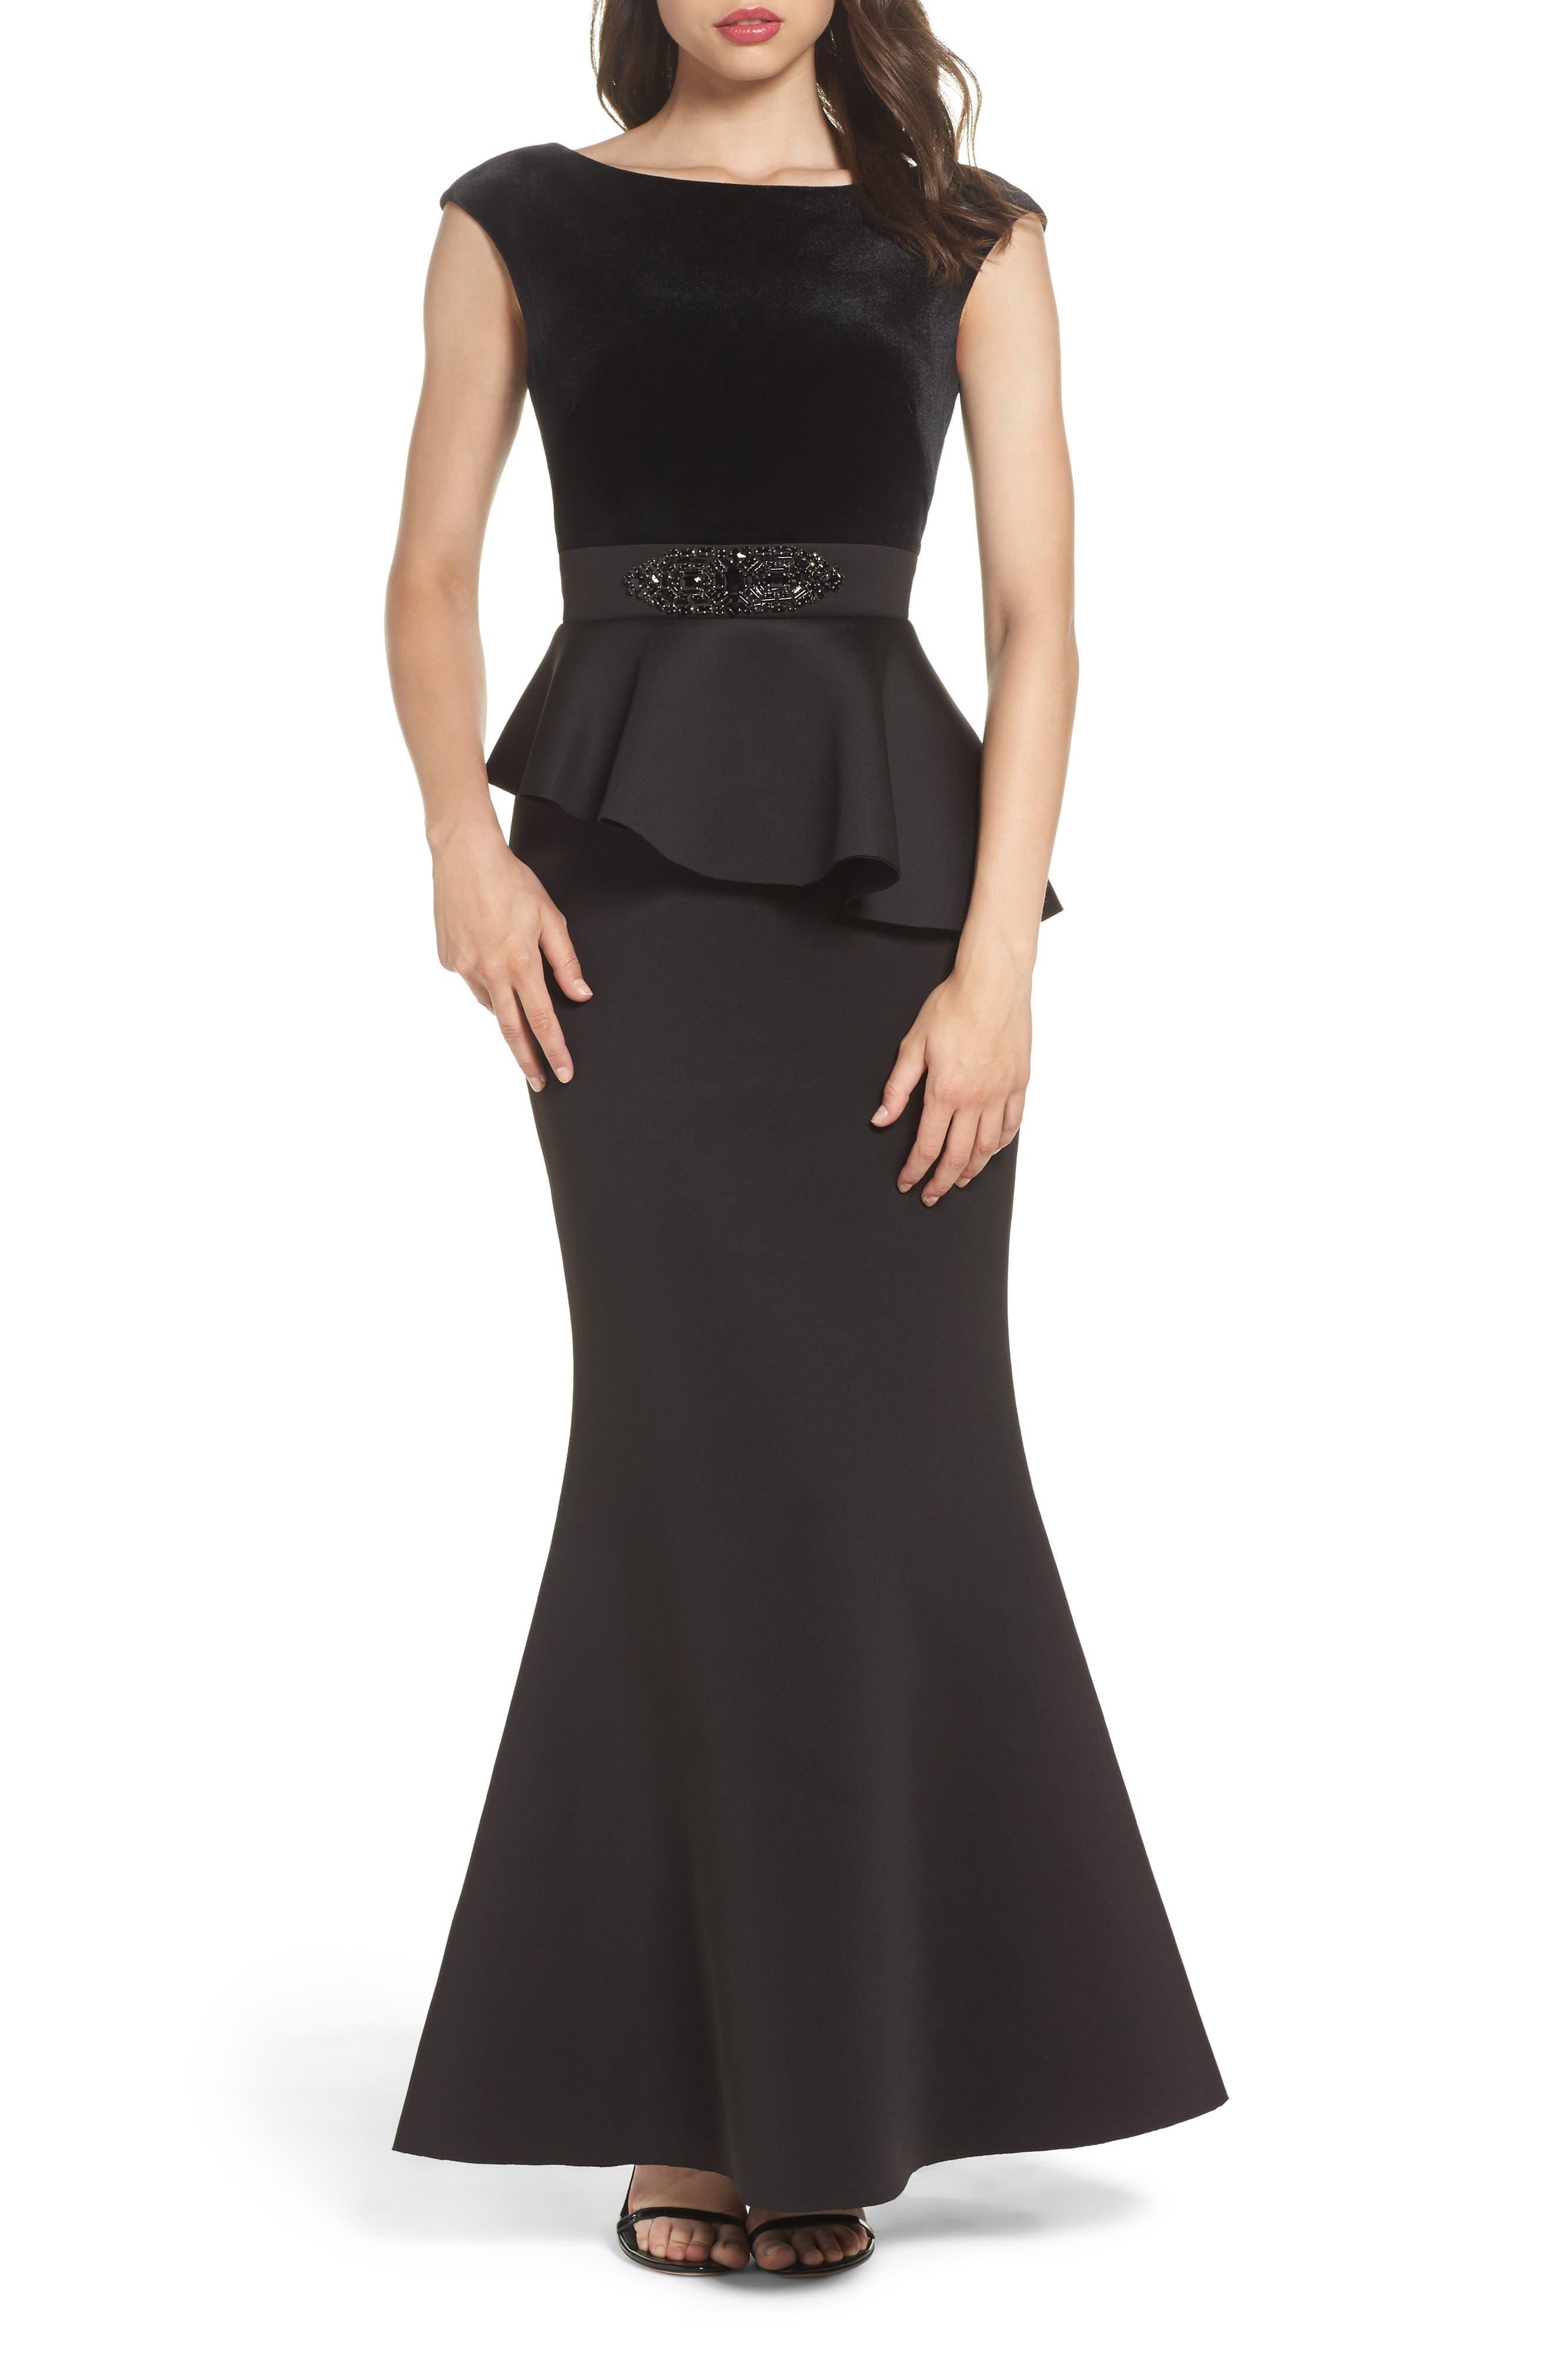 Main Image - Eliza J Cap Sleeve Mixed Media Peplum Gown